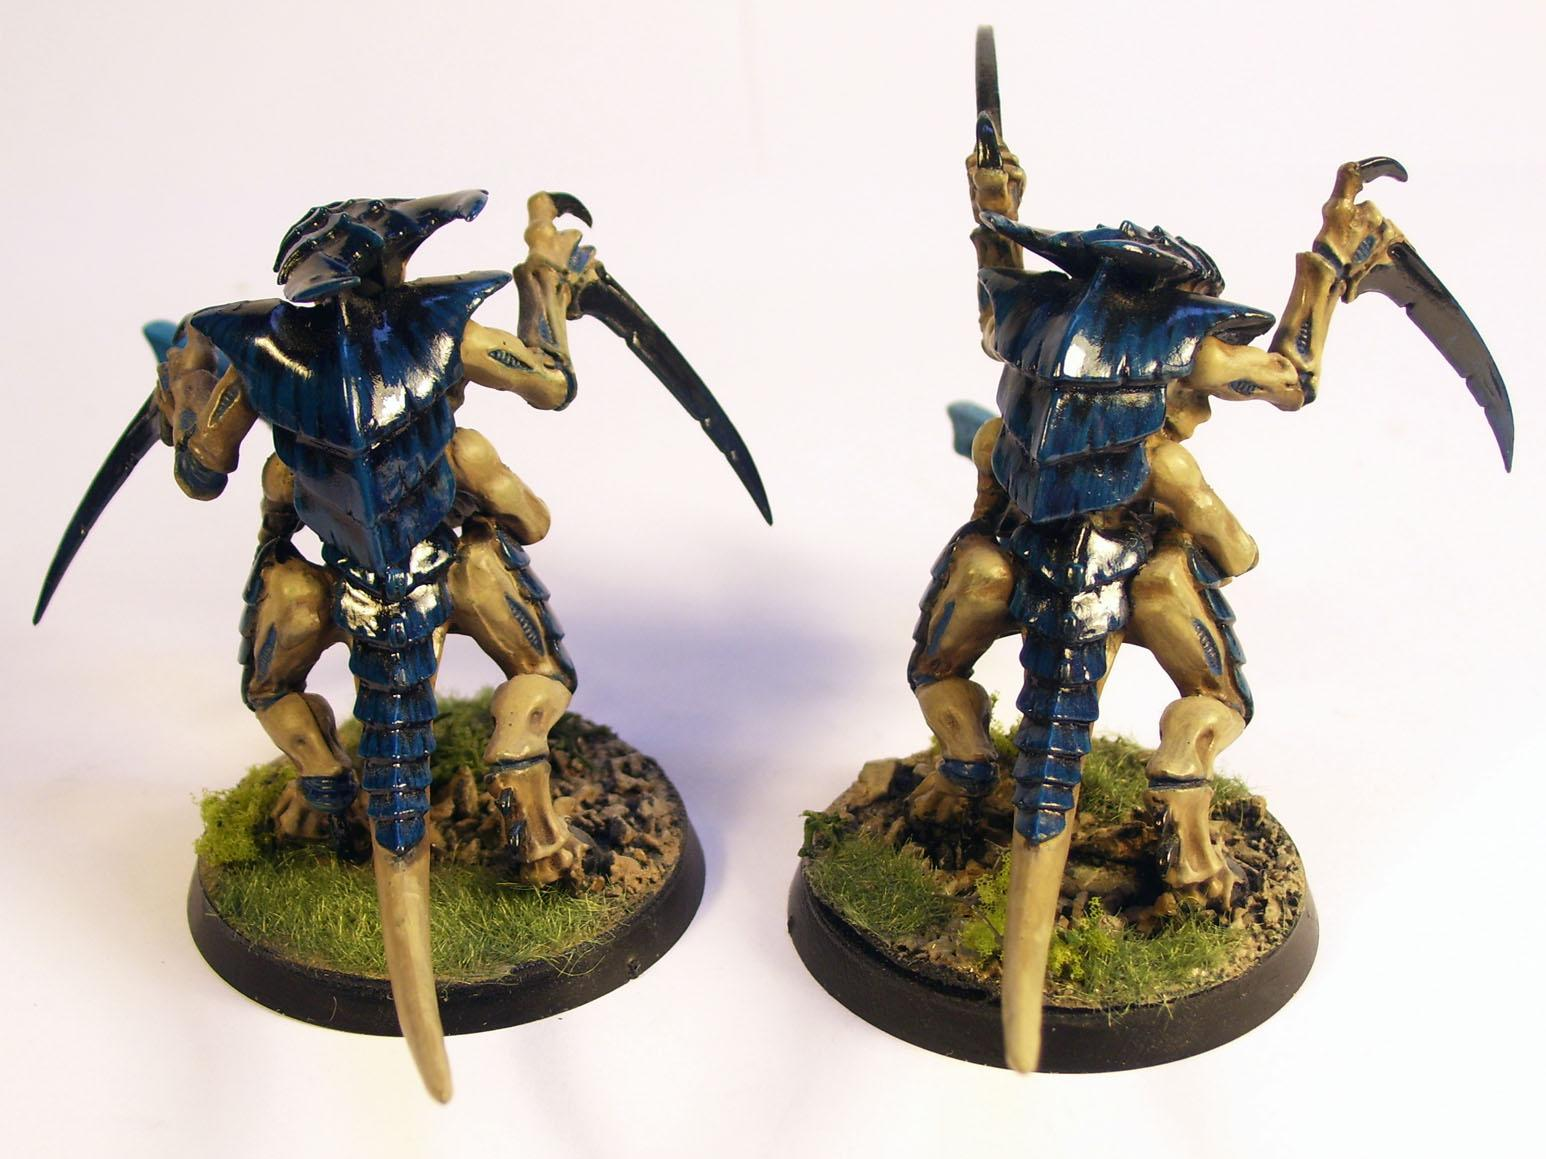 Blue, Lol, Splinter Fleet, Tyranids, Warhammer 40,000